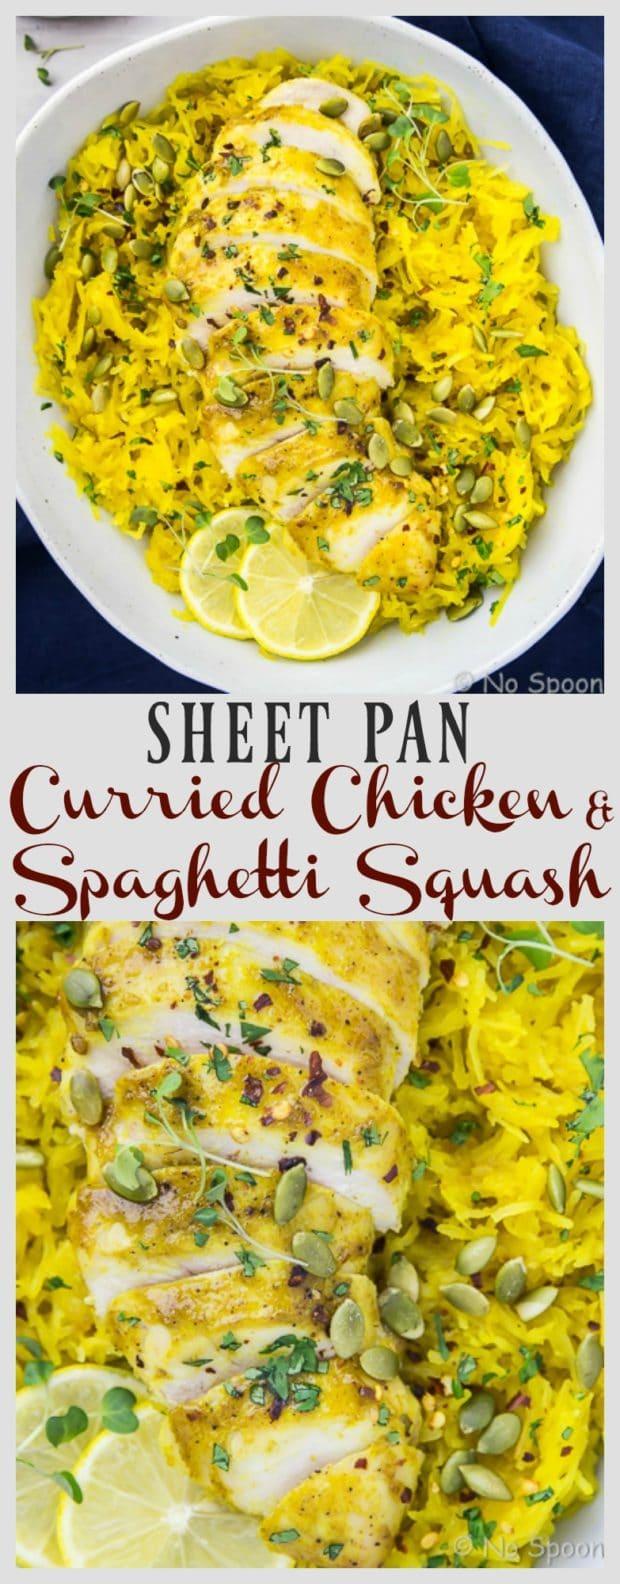 Baked Curried Chicken & Spaghetti Squash {Sheet Pan}